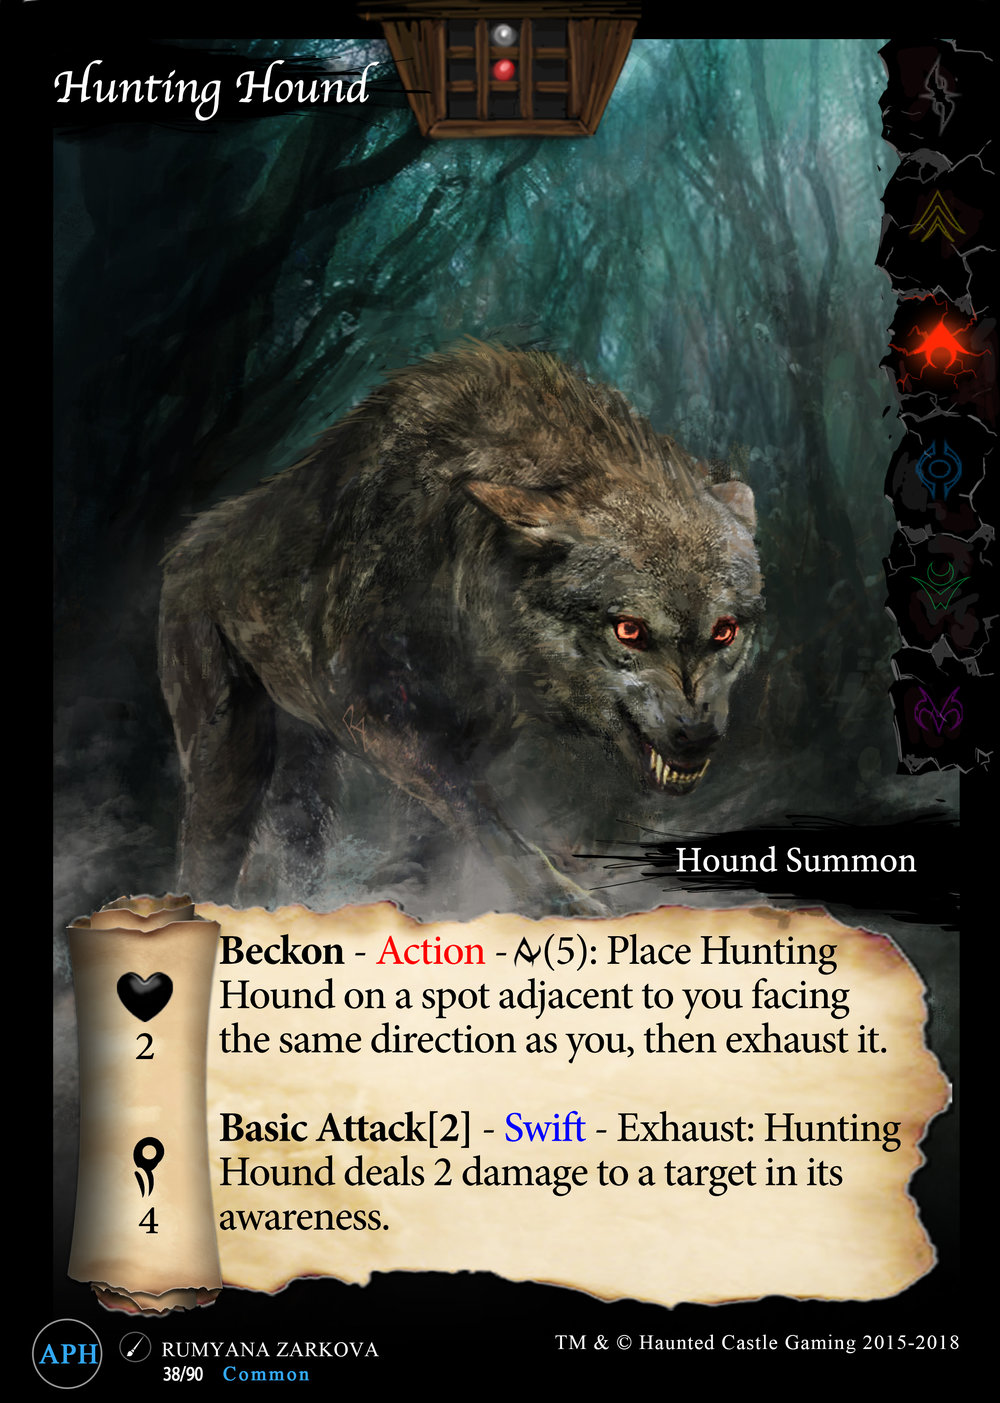 38-Hunting Hound.jpg